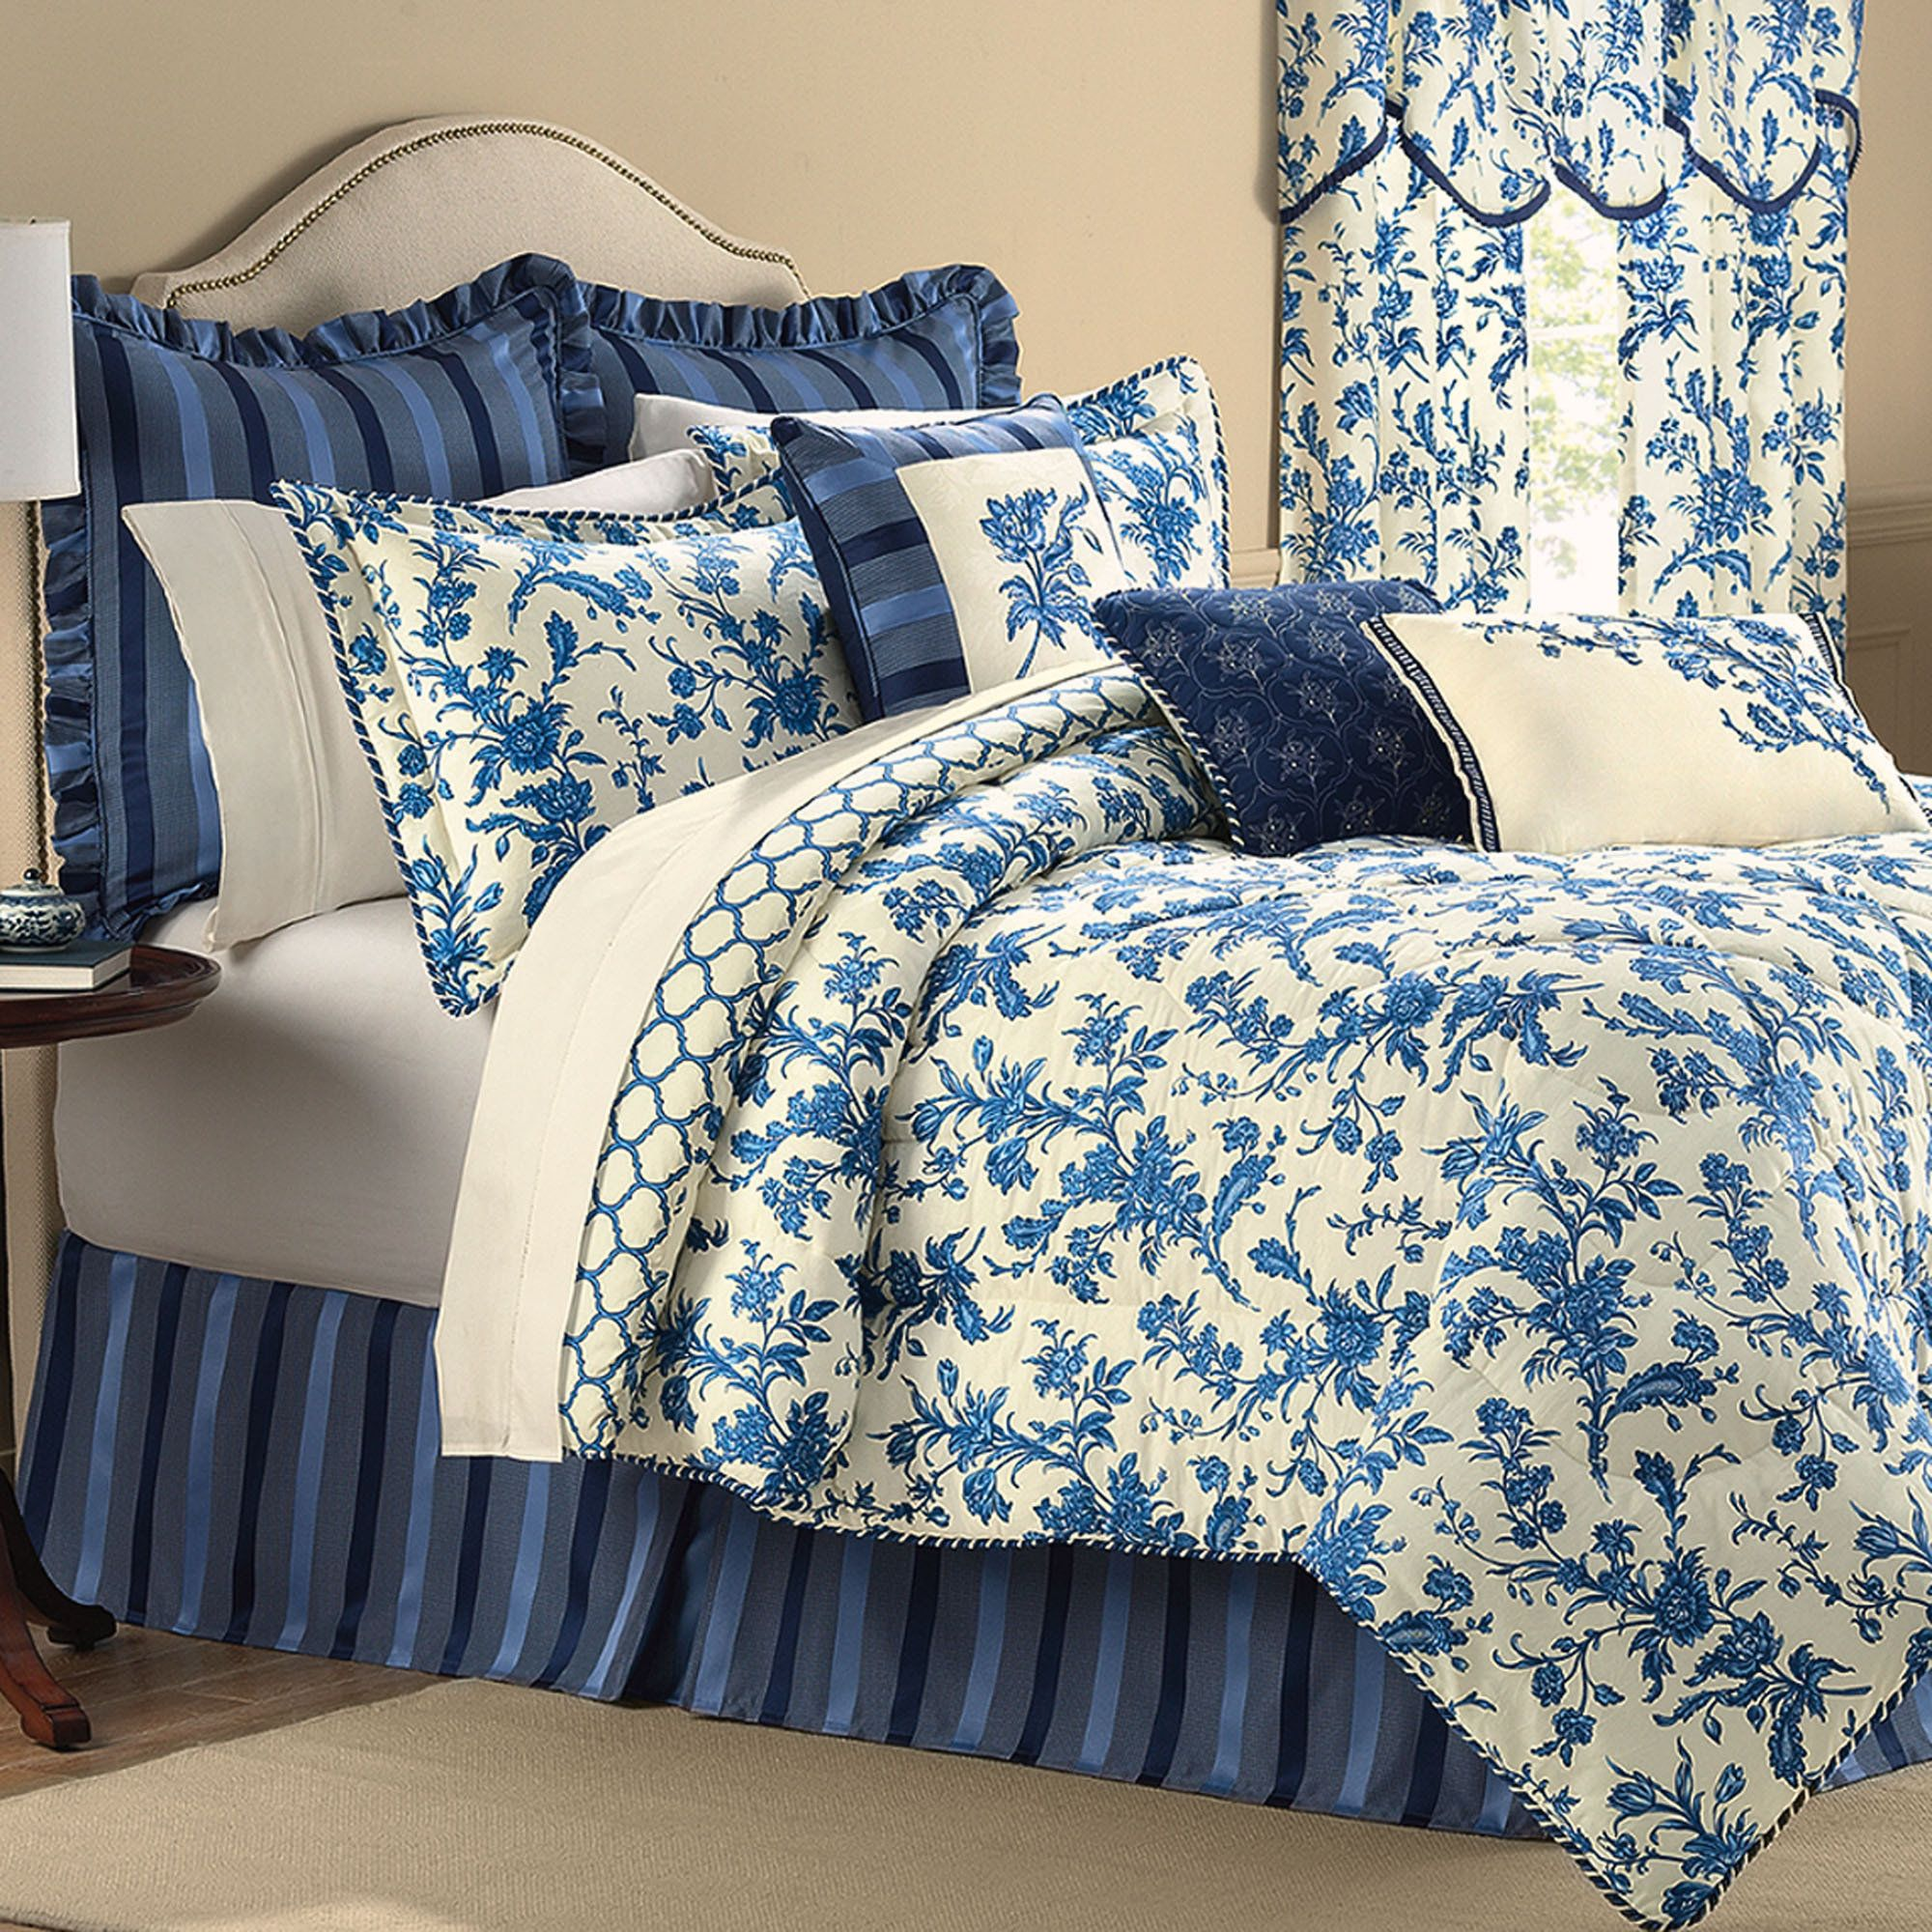 Spring Flowers Full Comforter Set Bedding Paisley Bedding Bed